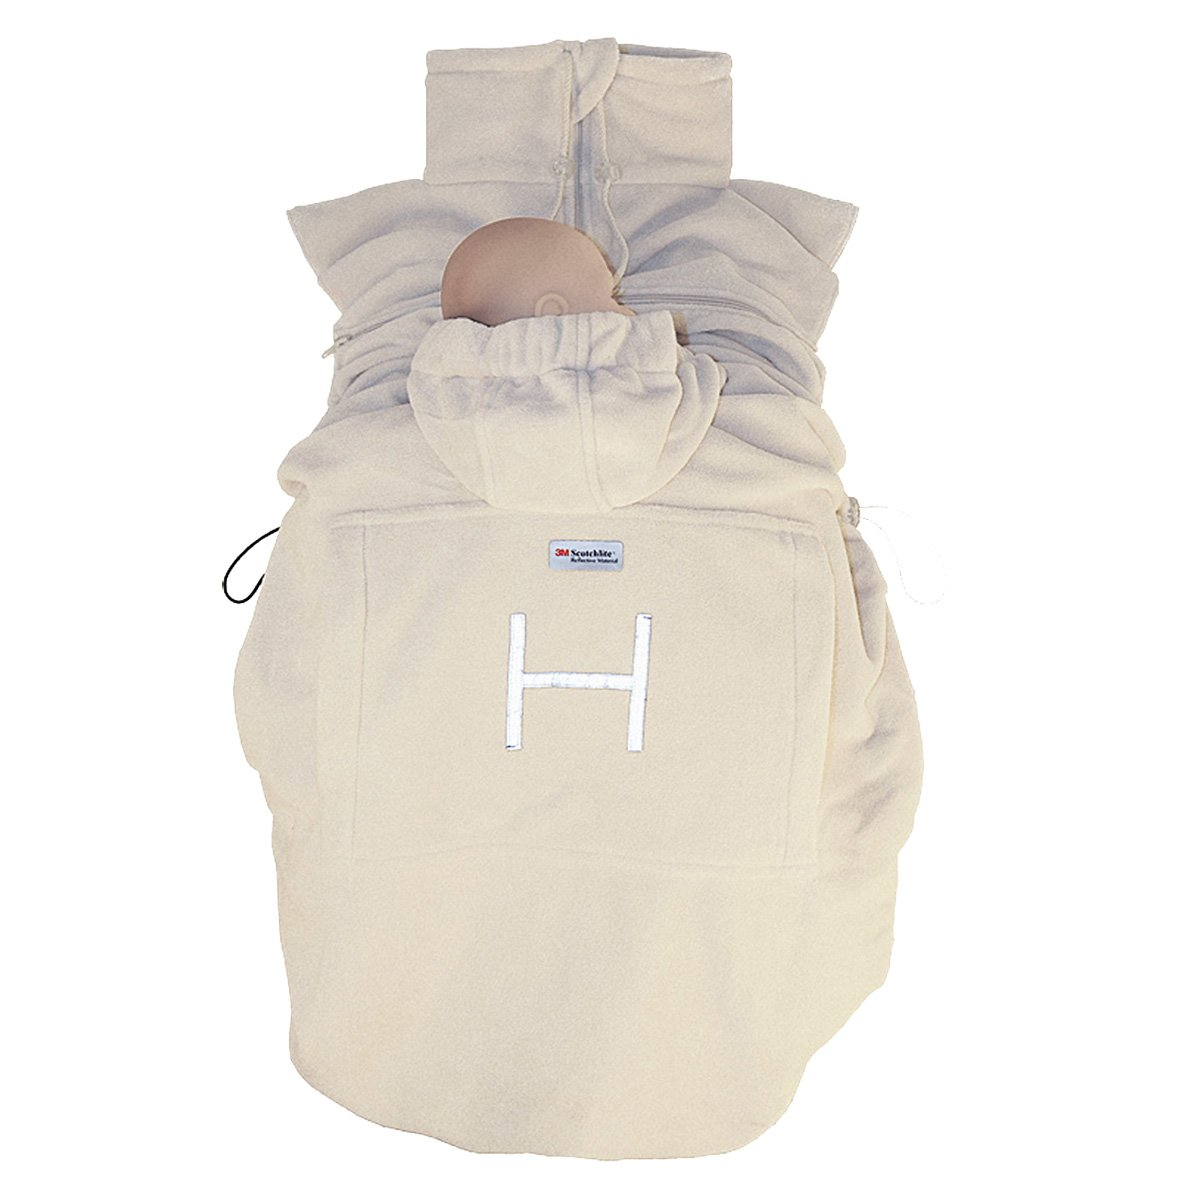 Hoppediz–-Sacca Basicin pile –sacco da trasporto per bambino, caldo porta-bebè fs-san